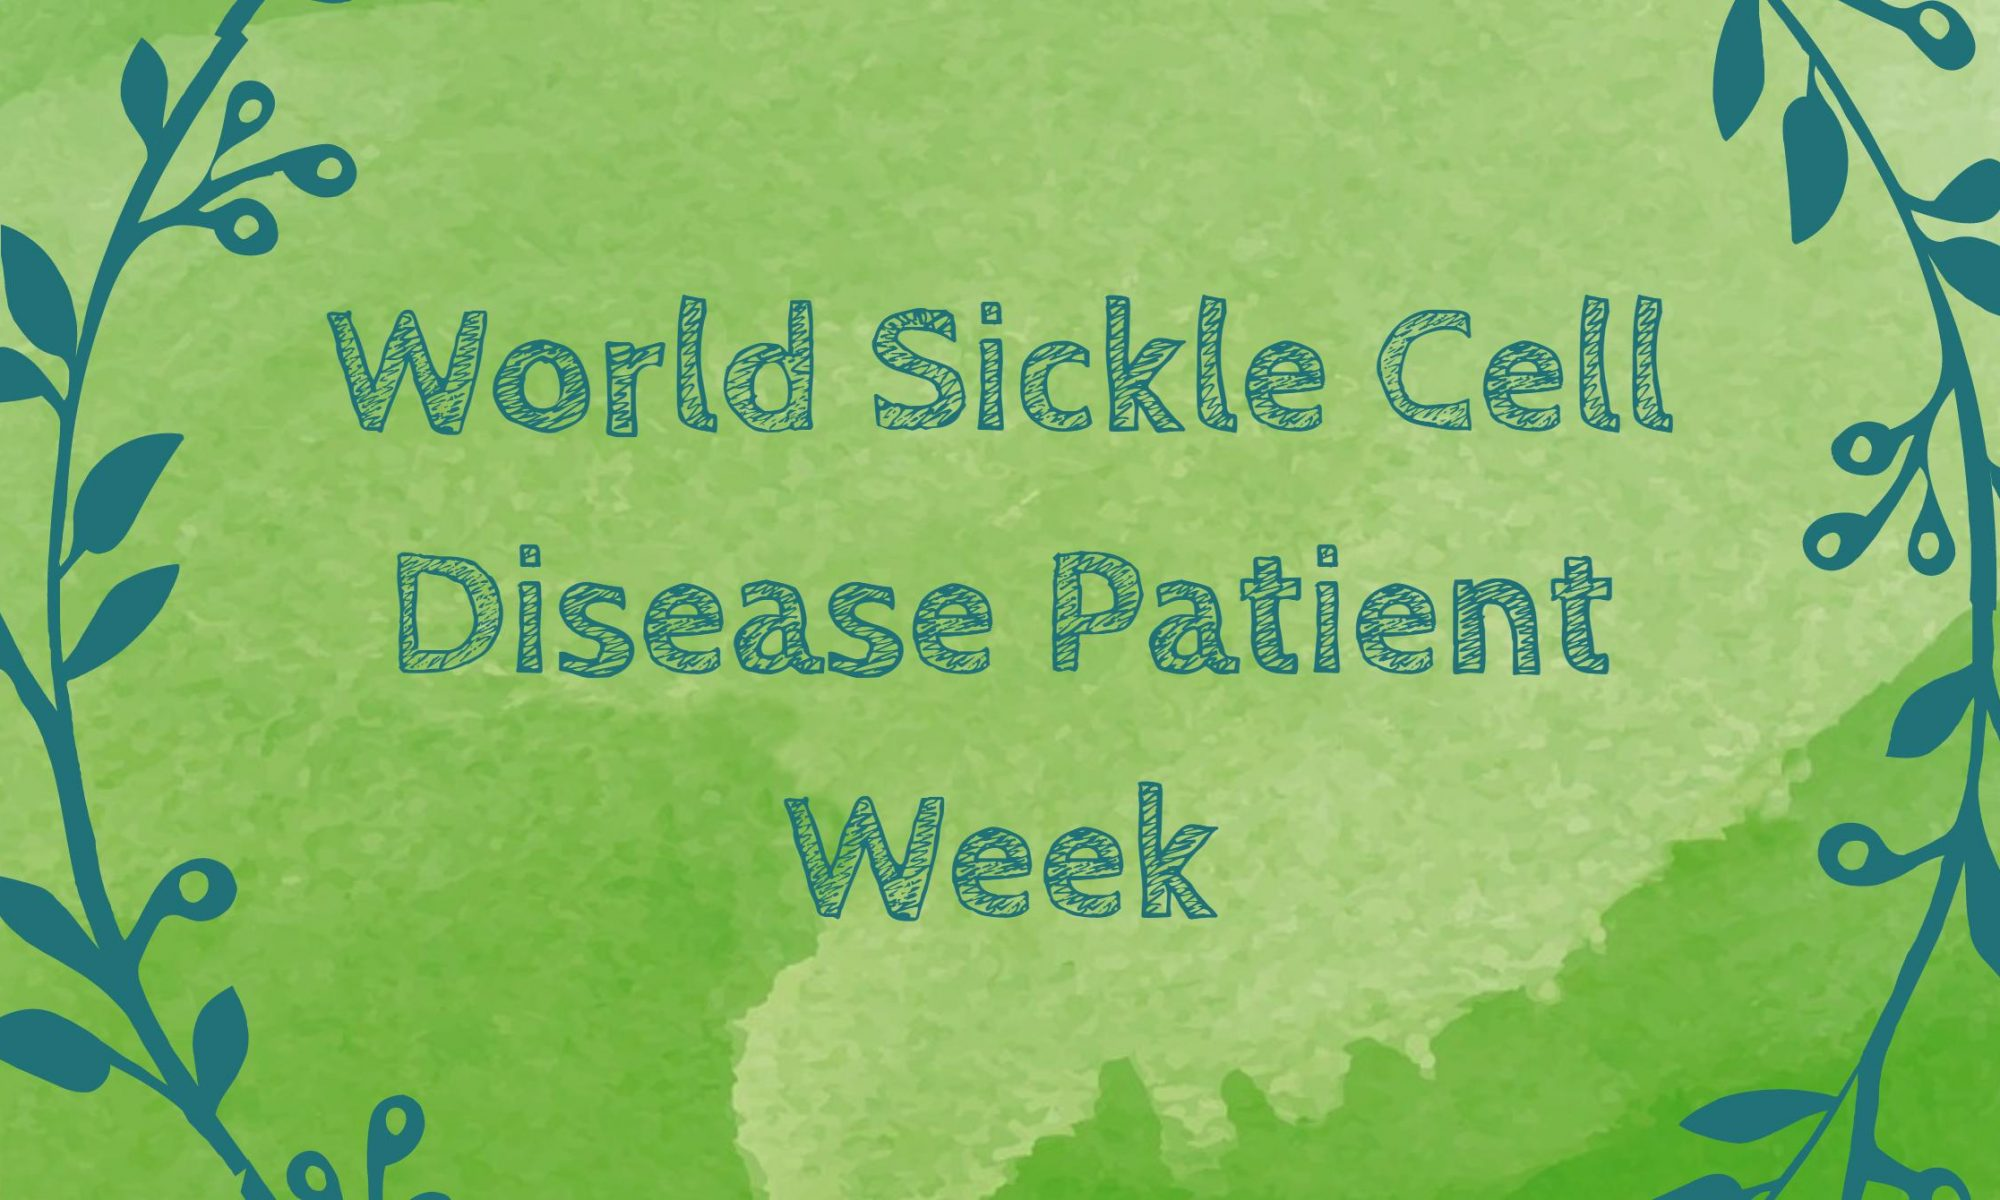 World Sickle Cell Disease Patient Week